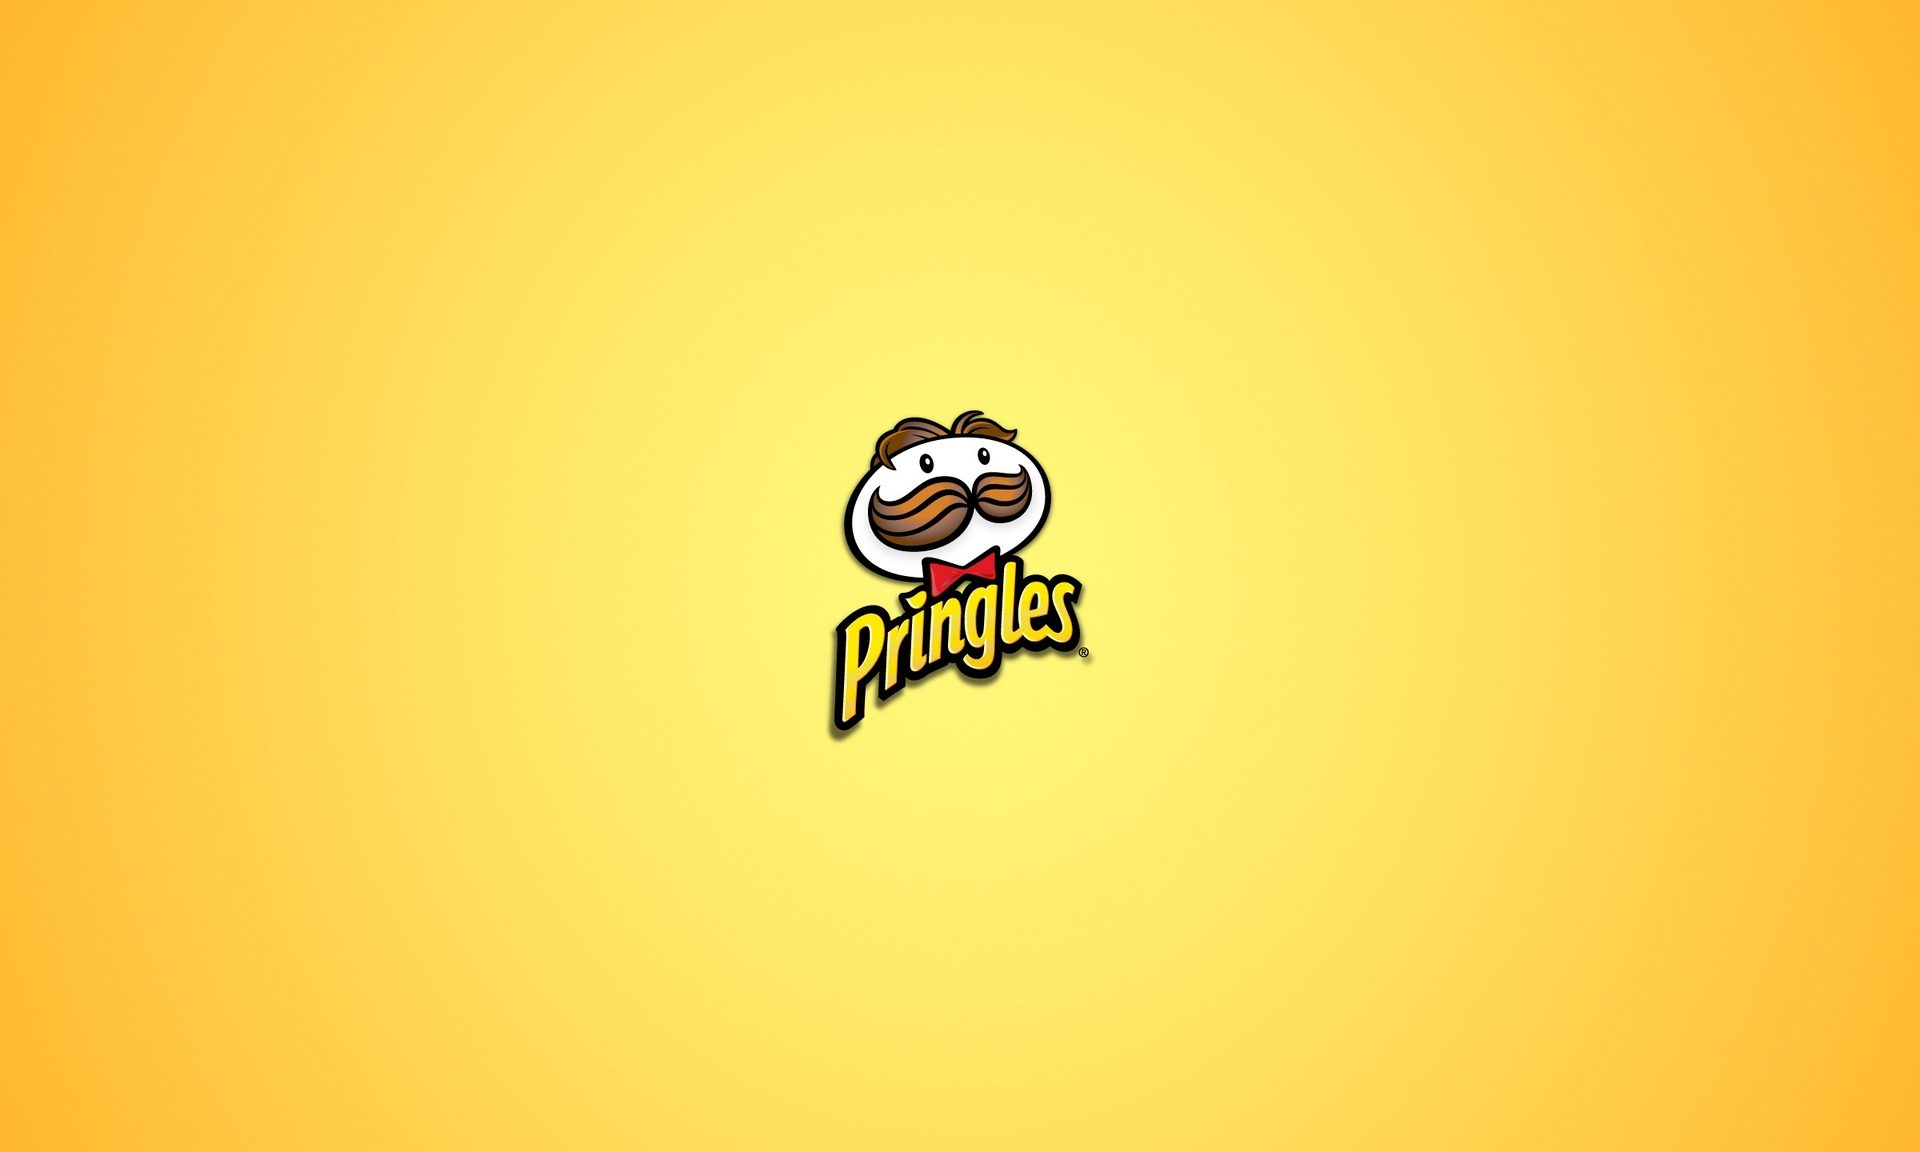 Pringles Logo Wallpaper In Yellow Background PaperPull 1920x1152